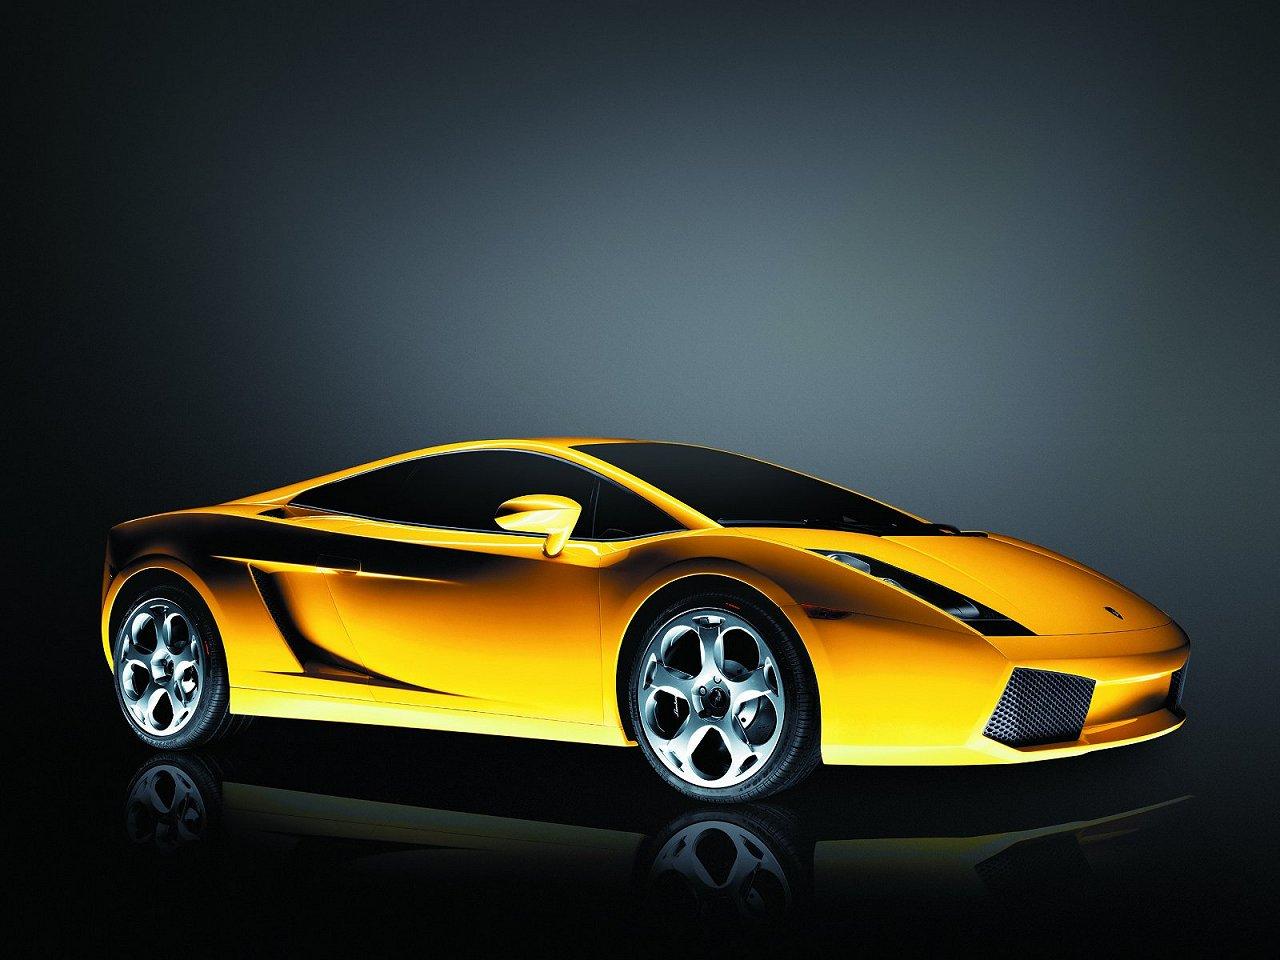 The Amazing Car Lamborghini Wallpaper